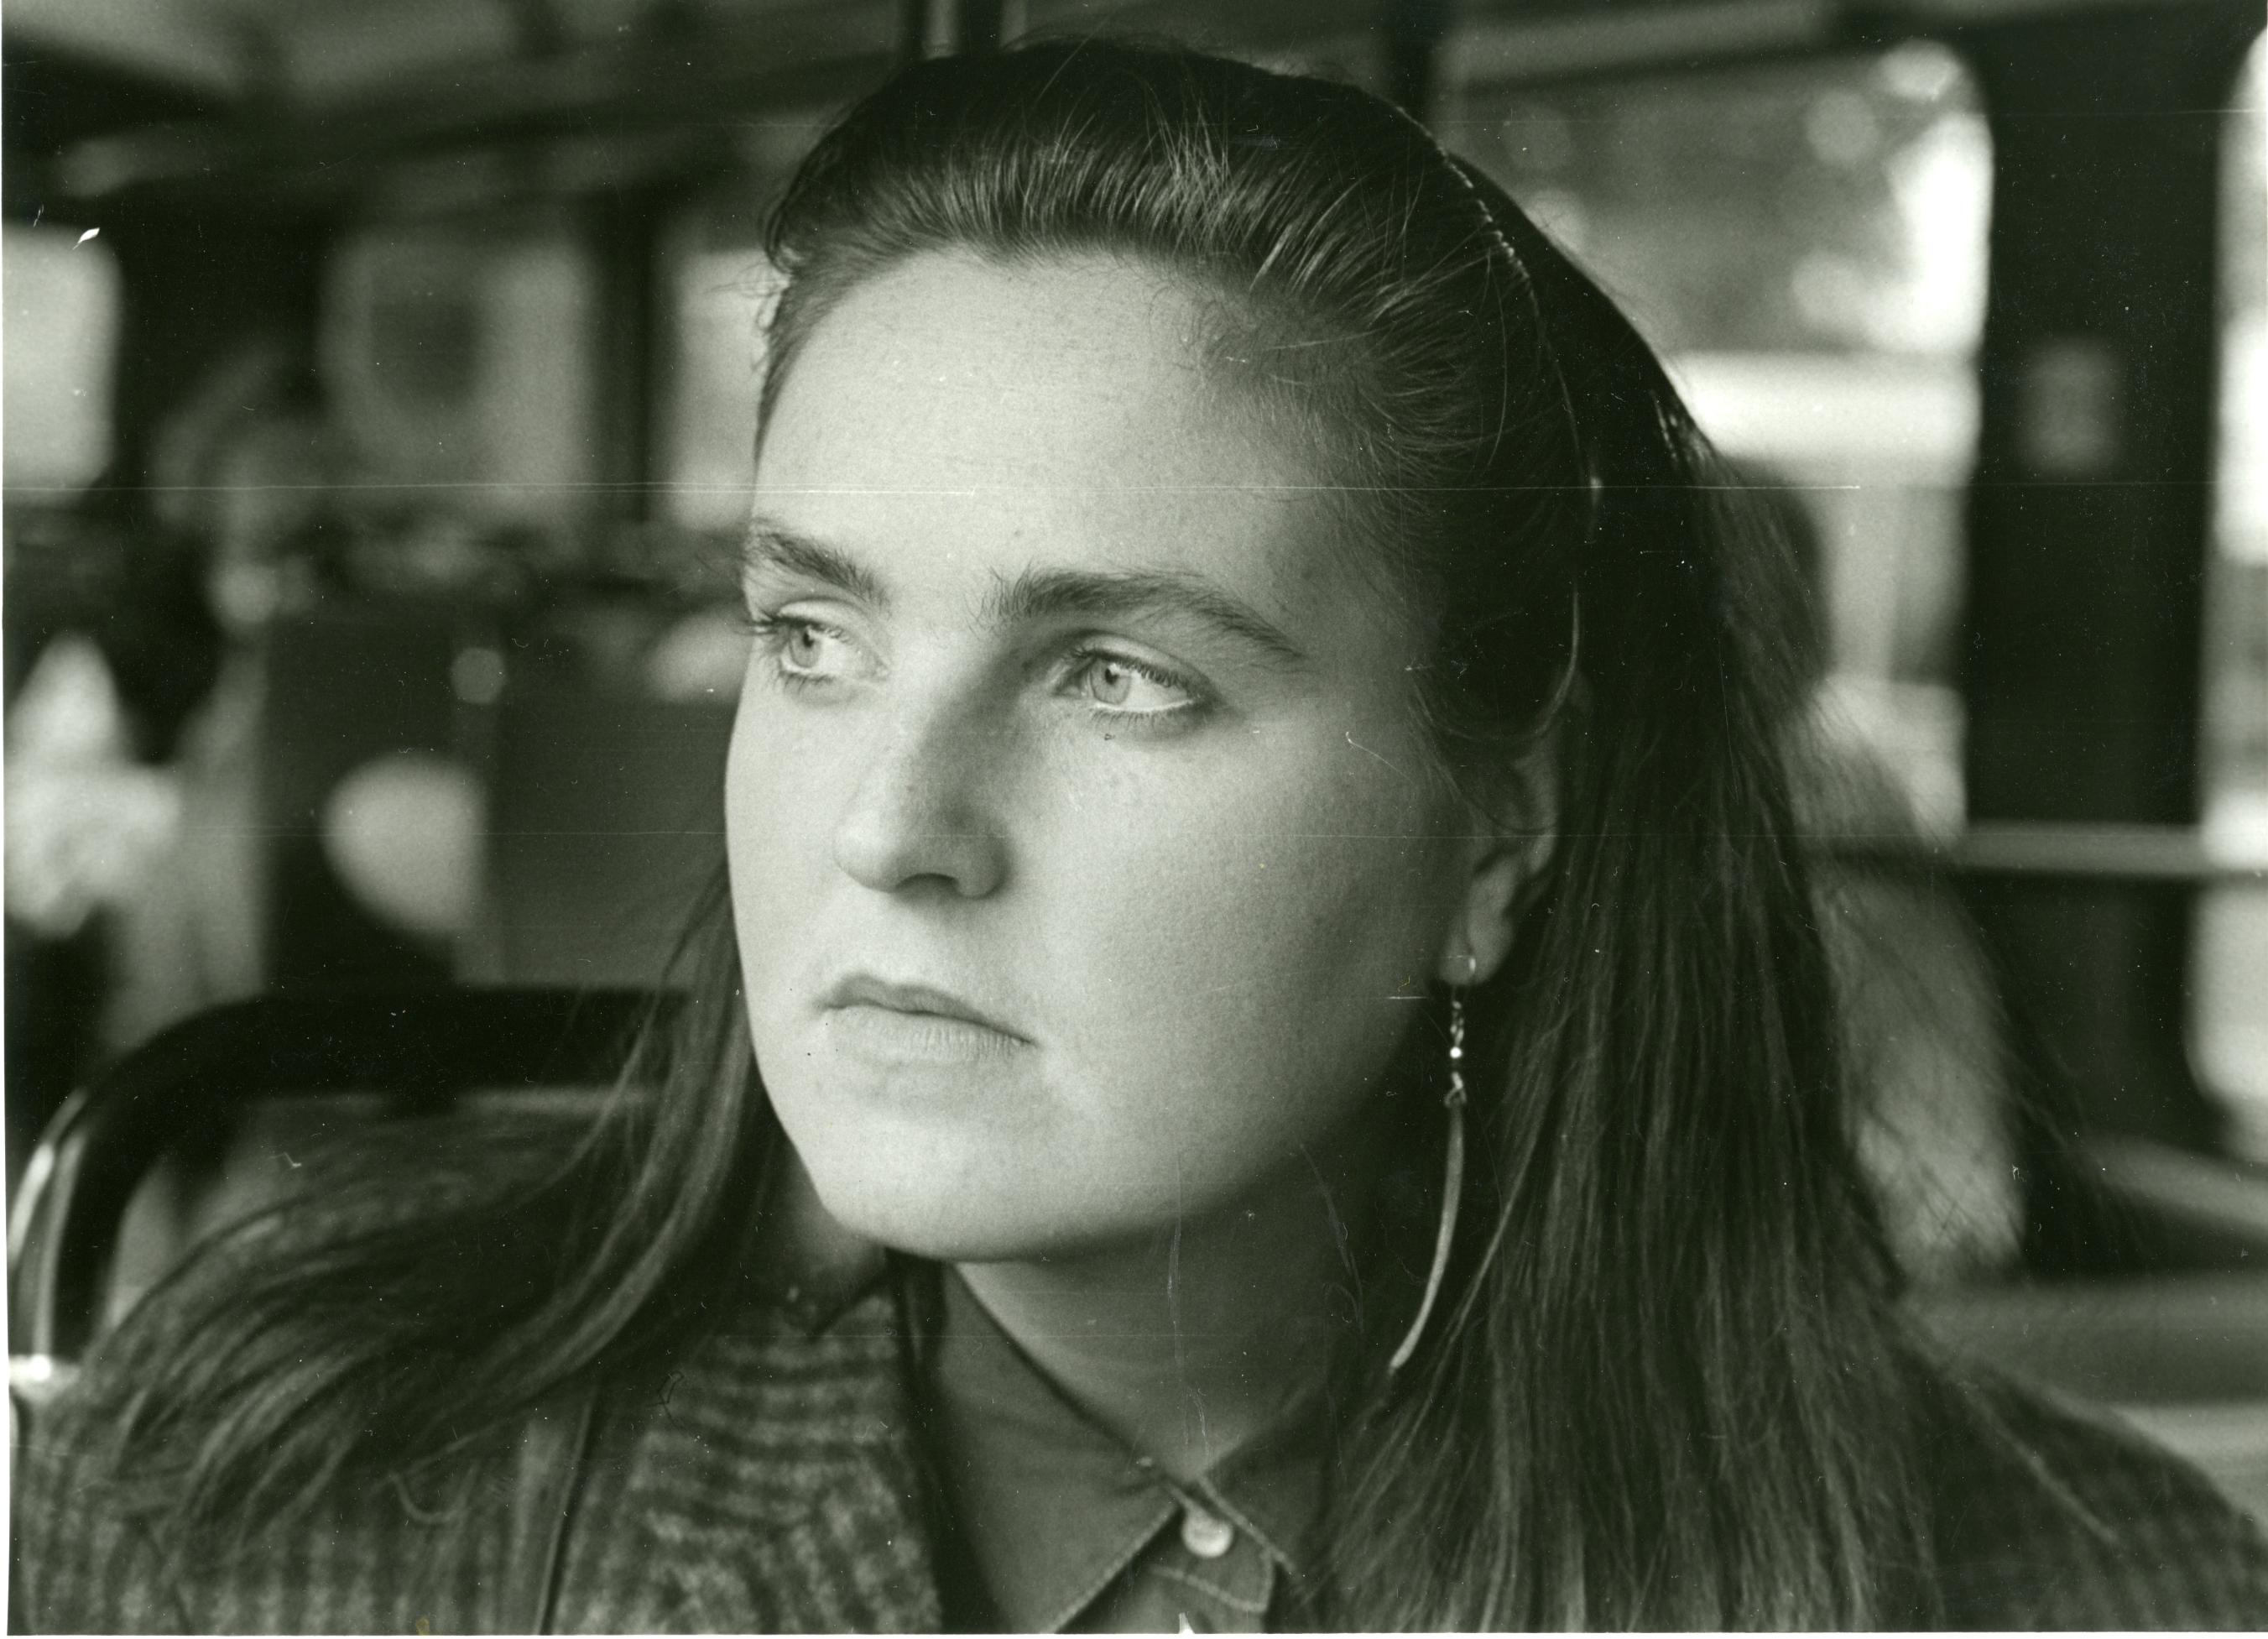 Ewa Cederstam